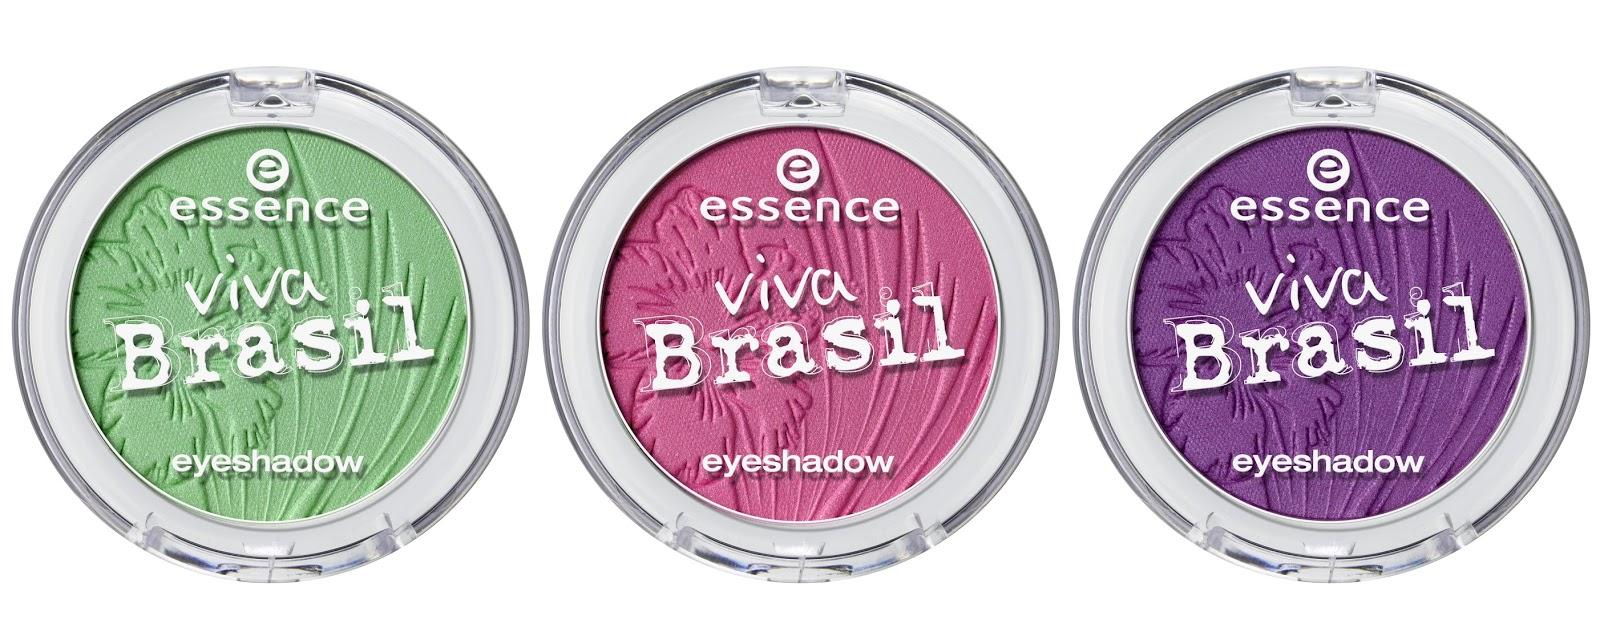 essence viva brasil – eyeshadow